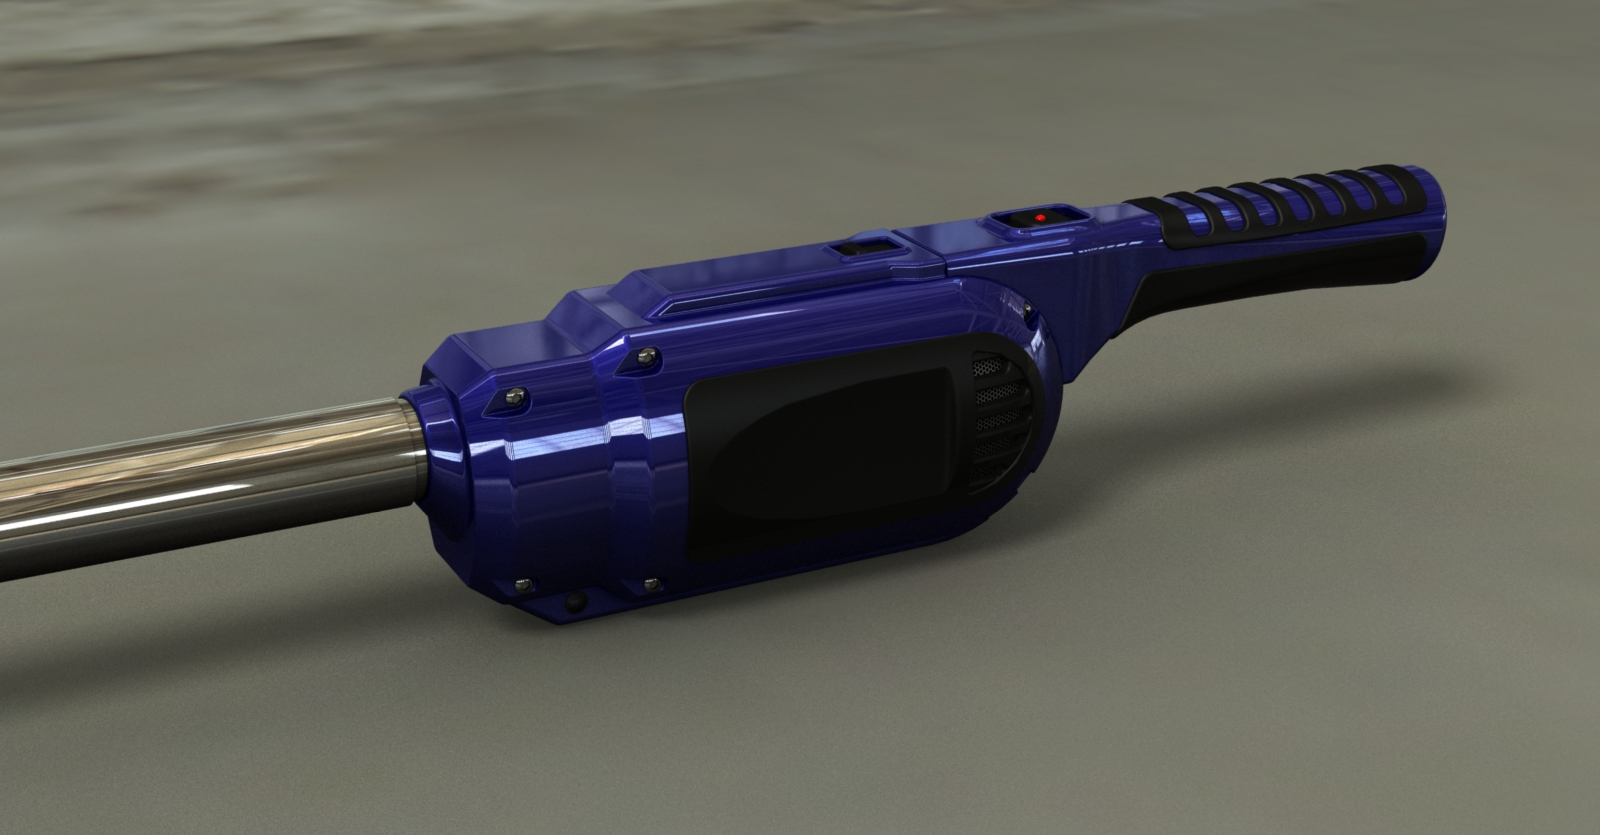 Rendering of Airlighter design - blue